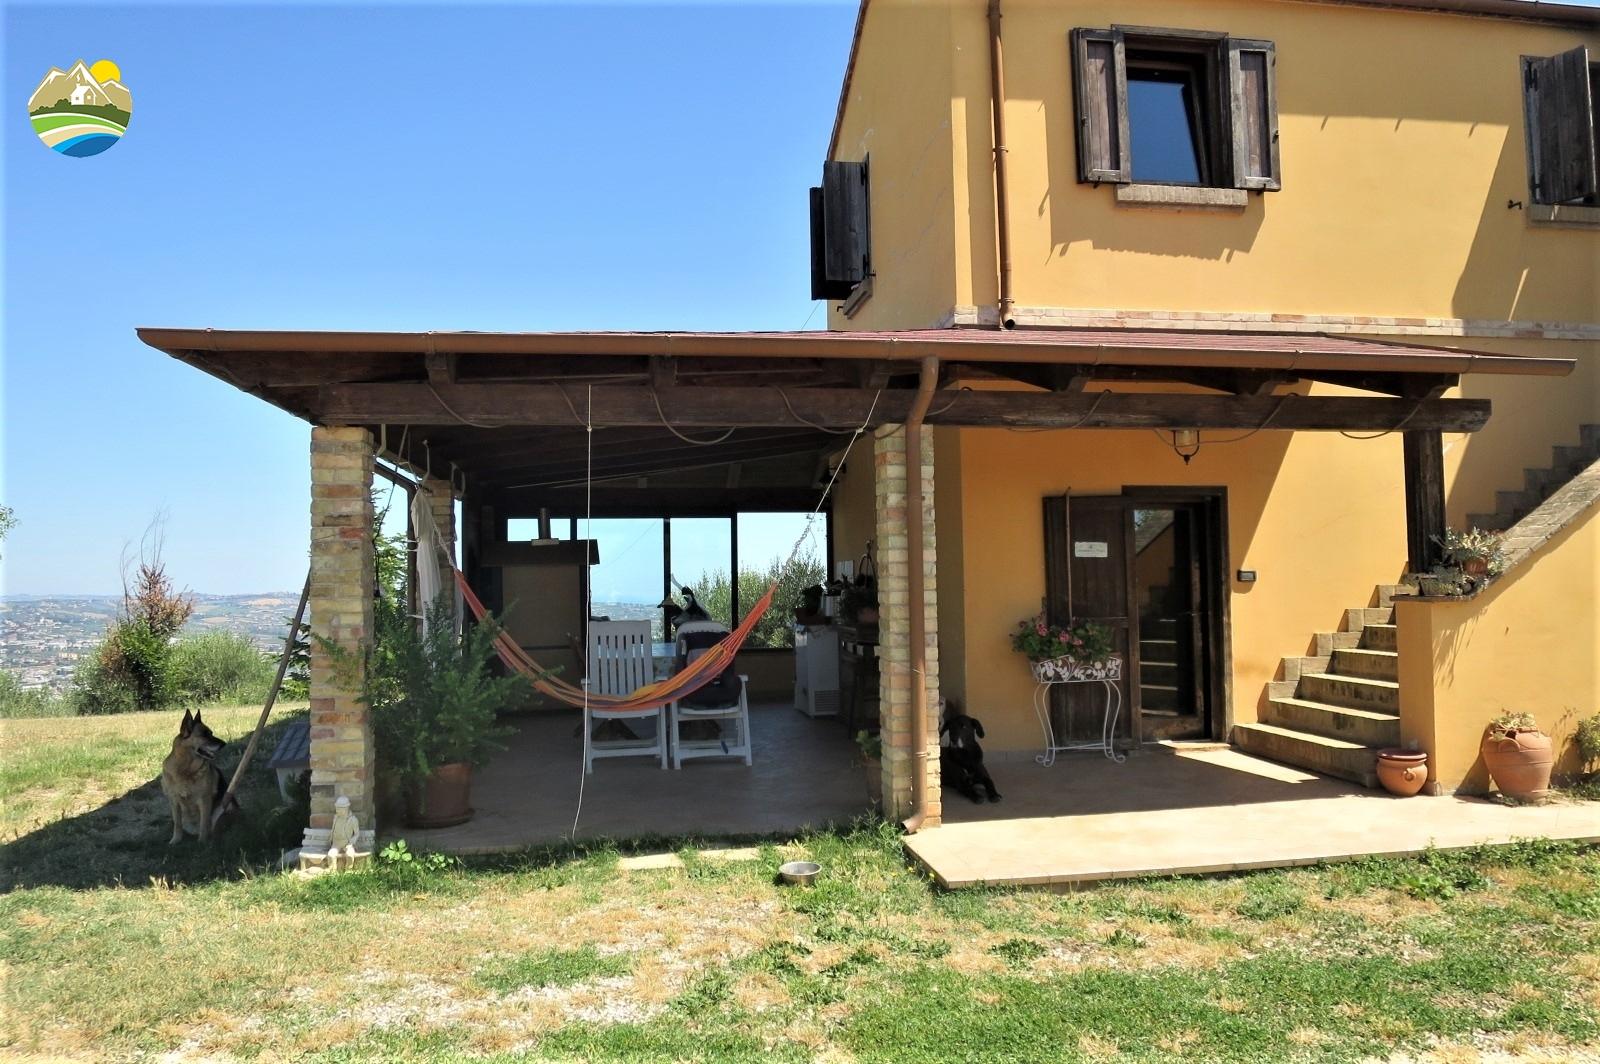 Country Houses Country Houses for sale Morro D'Oro (TE), Casa del Moro - Morro D'Oro - EUR 327.141 600